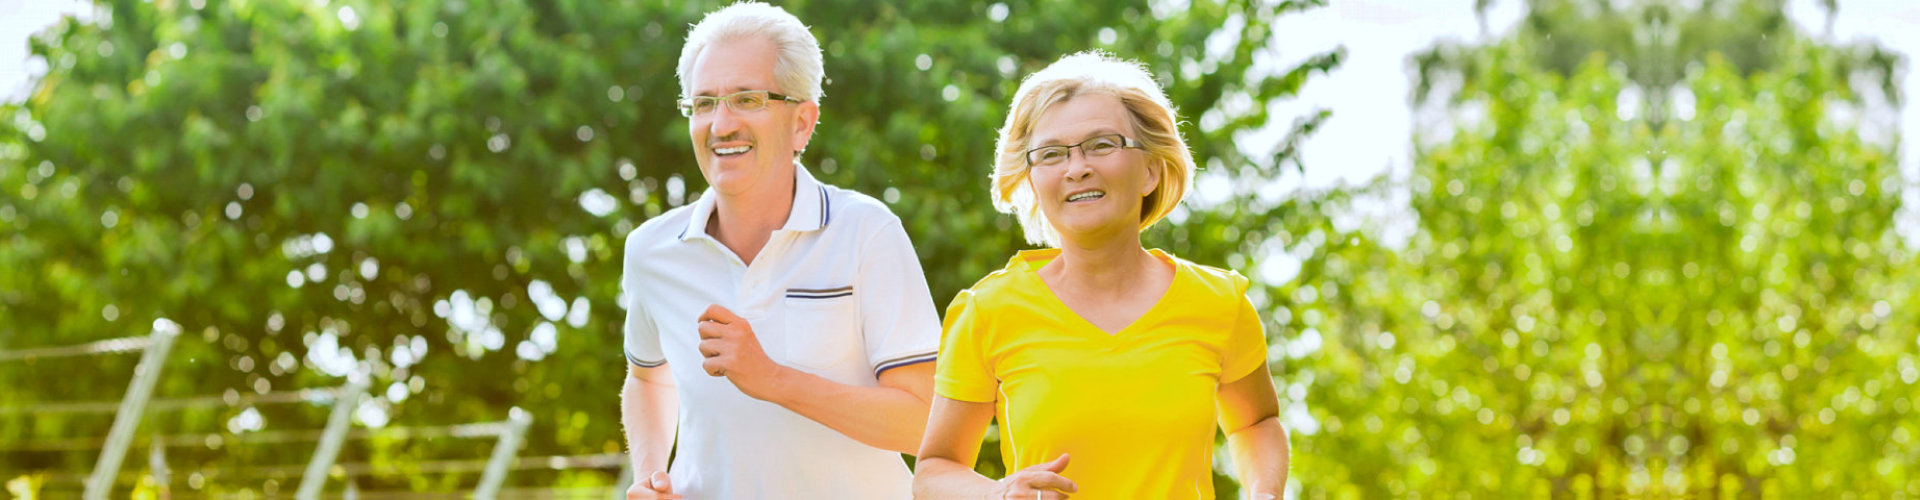 elderly couple running on the park